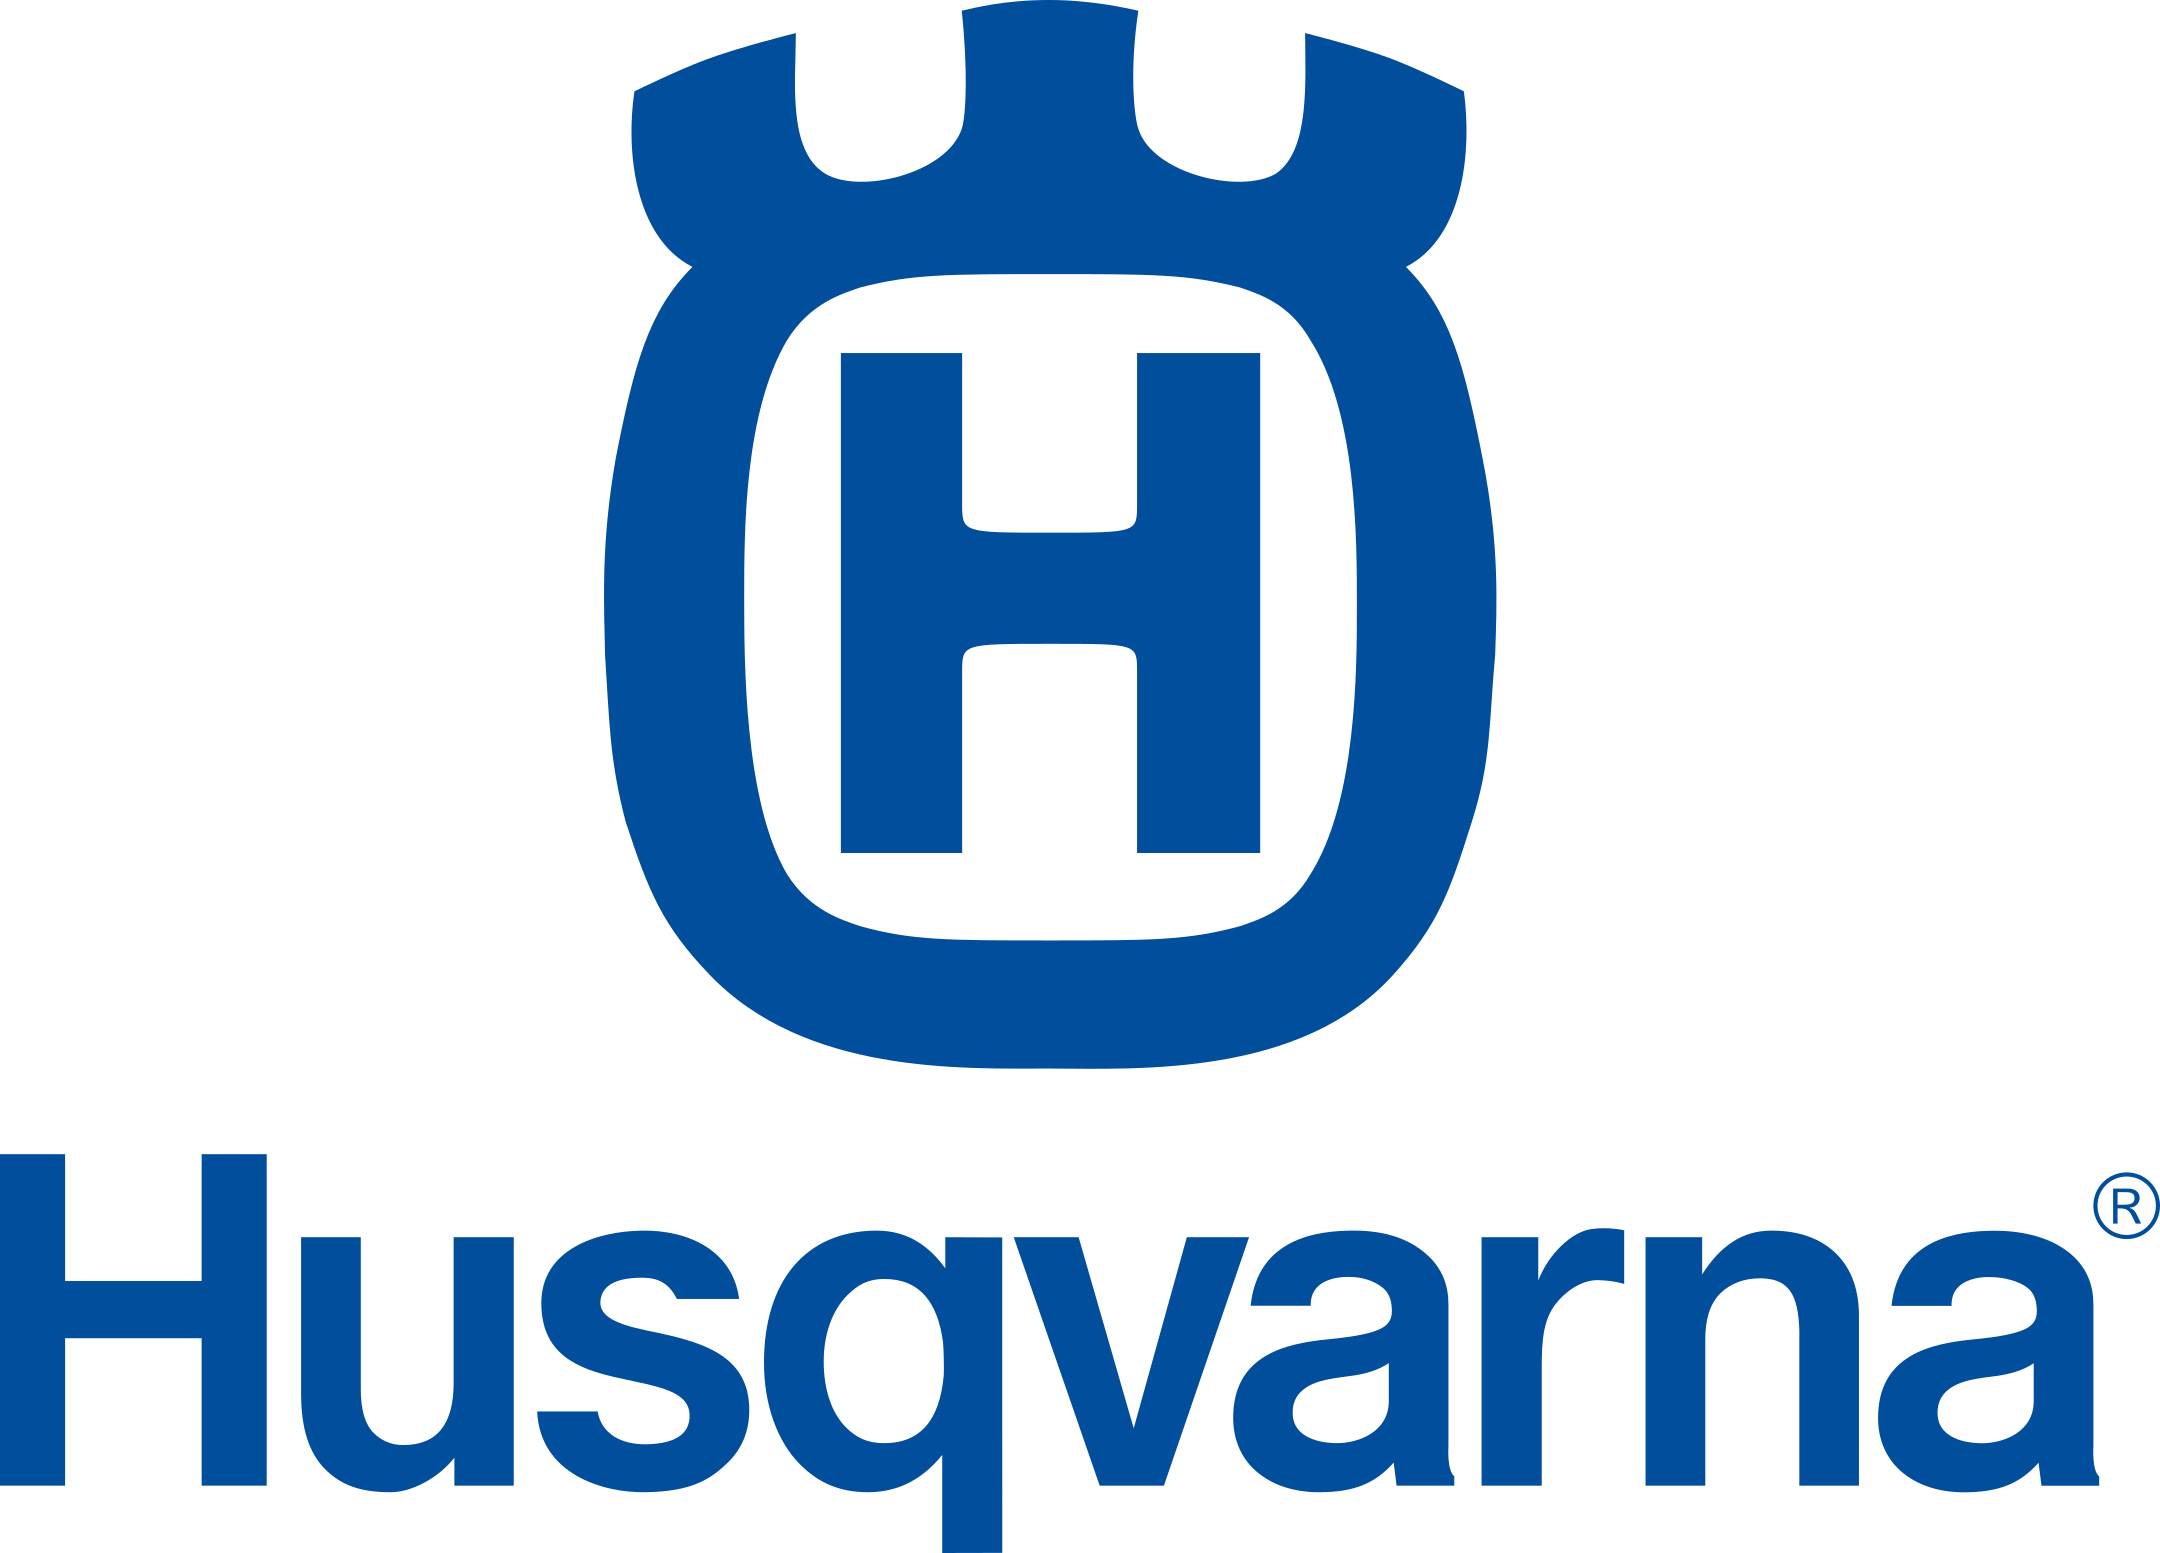 husqvarna-logo-3